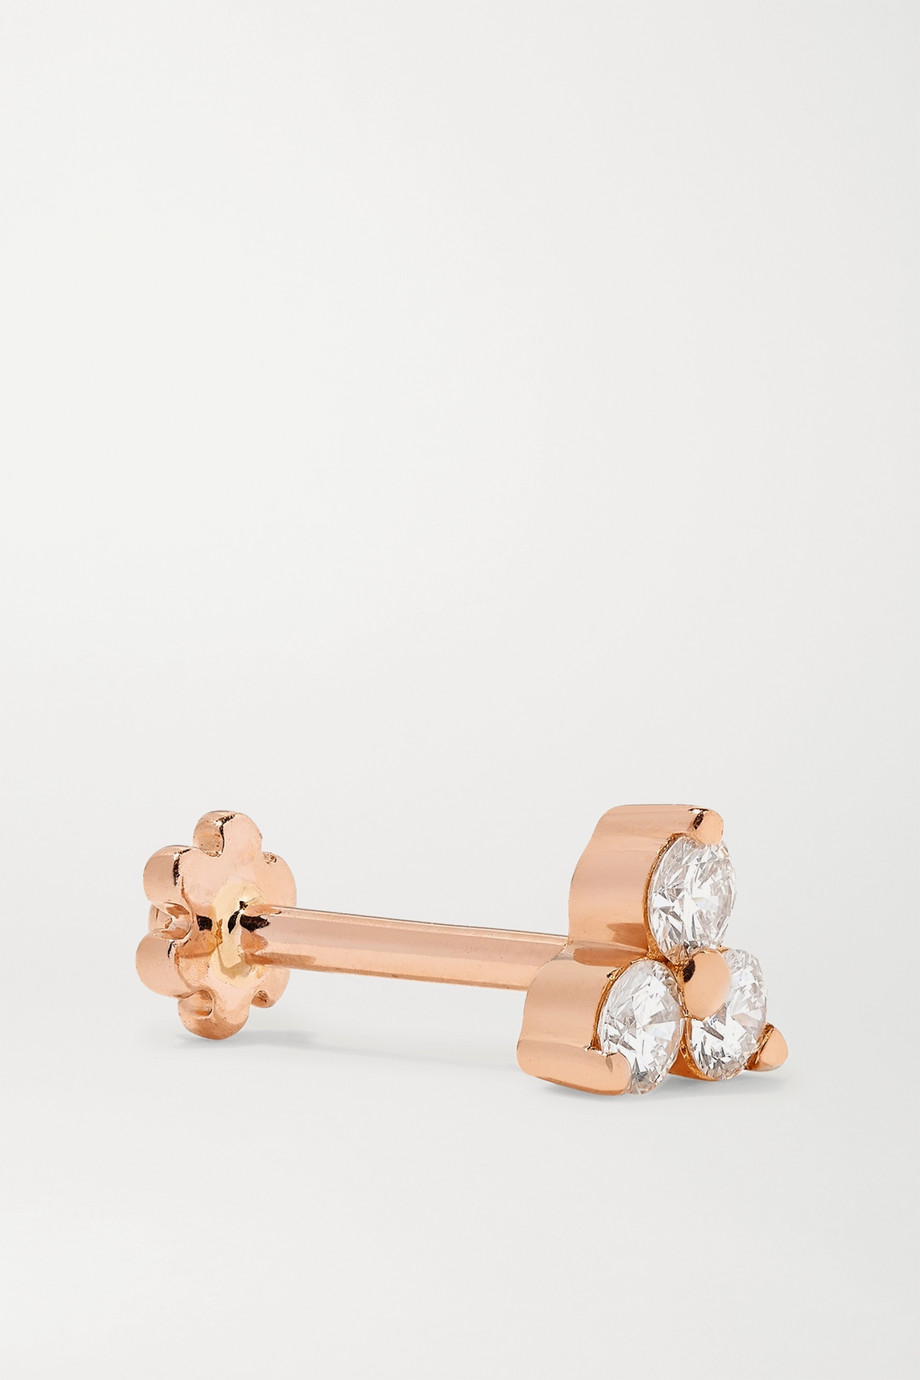 Maria Tash 18-karat rose gold diamond earring